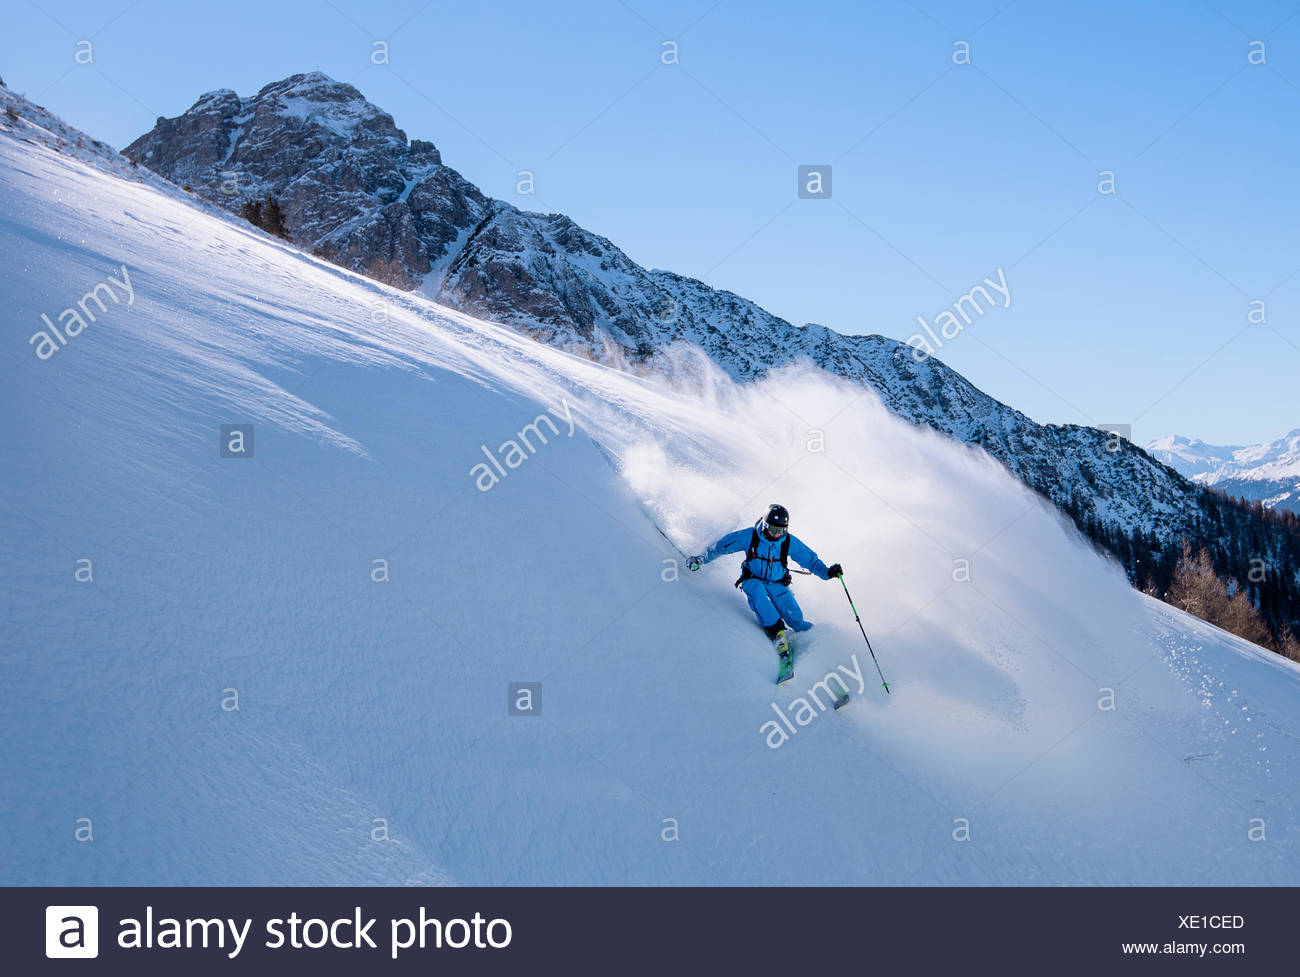 Freerider off-piste in deep snow, Muttereralmpark, Spitzmandl (2206m) behind, North Tyrol, Austria - Stock Image